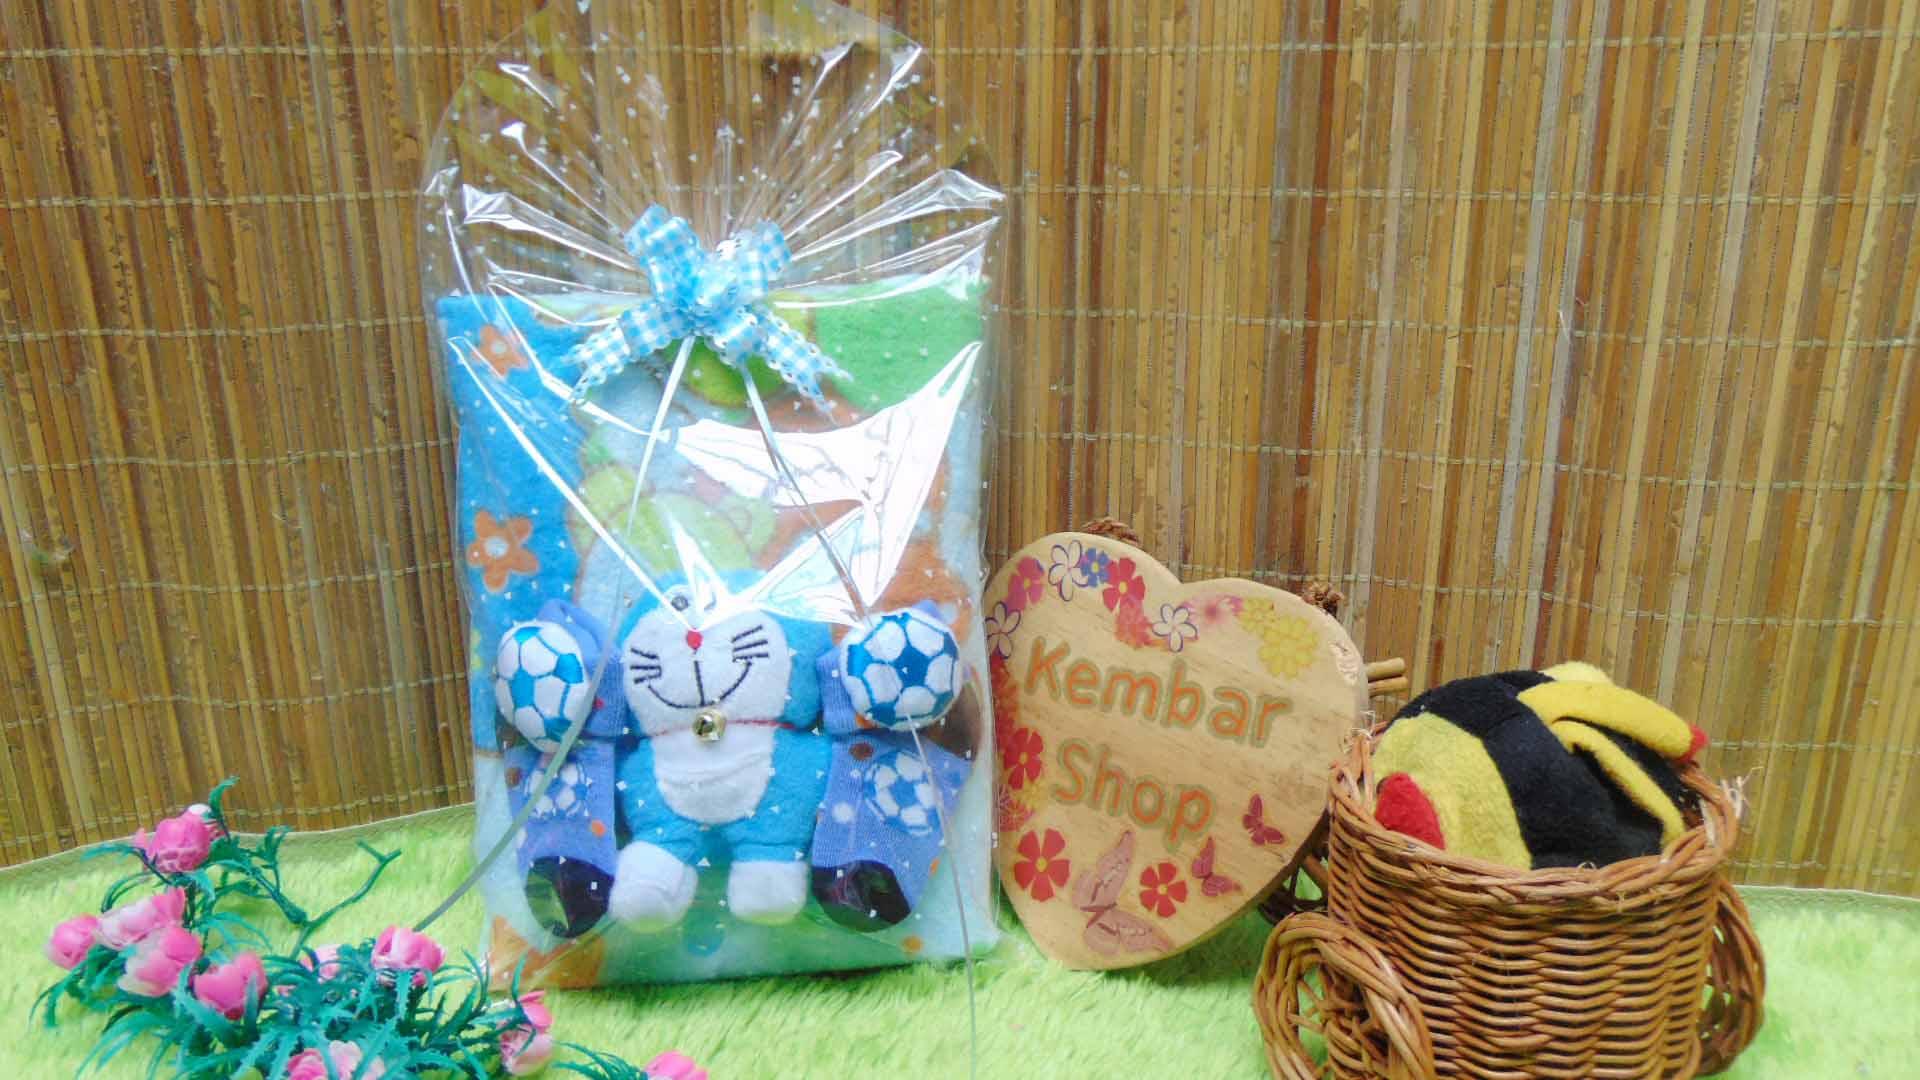 FREE KARTU UCAPAN hampers baby gift set paket kado lahiran souvenir bayi newborn HANDUK SOCK BONEKA biru